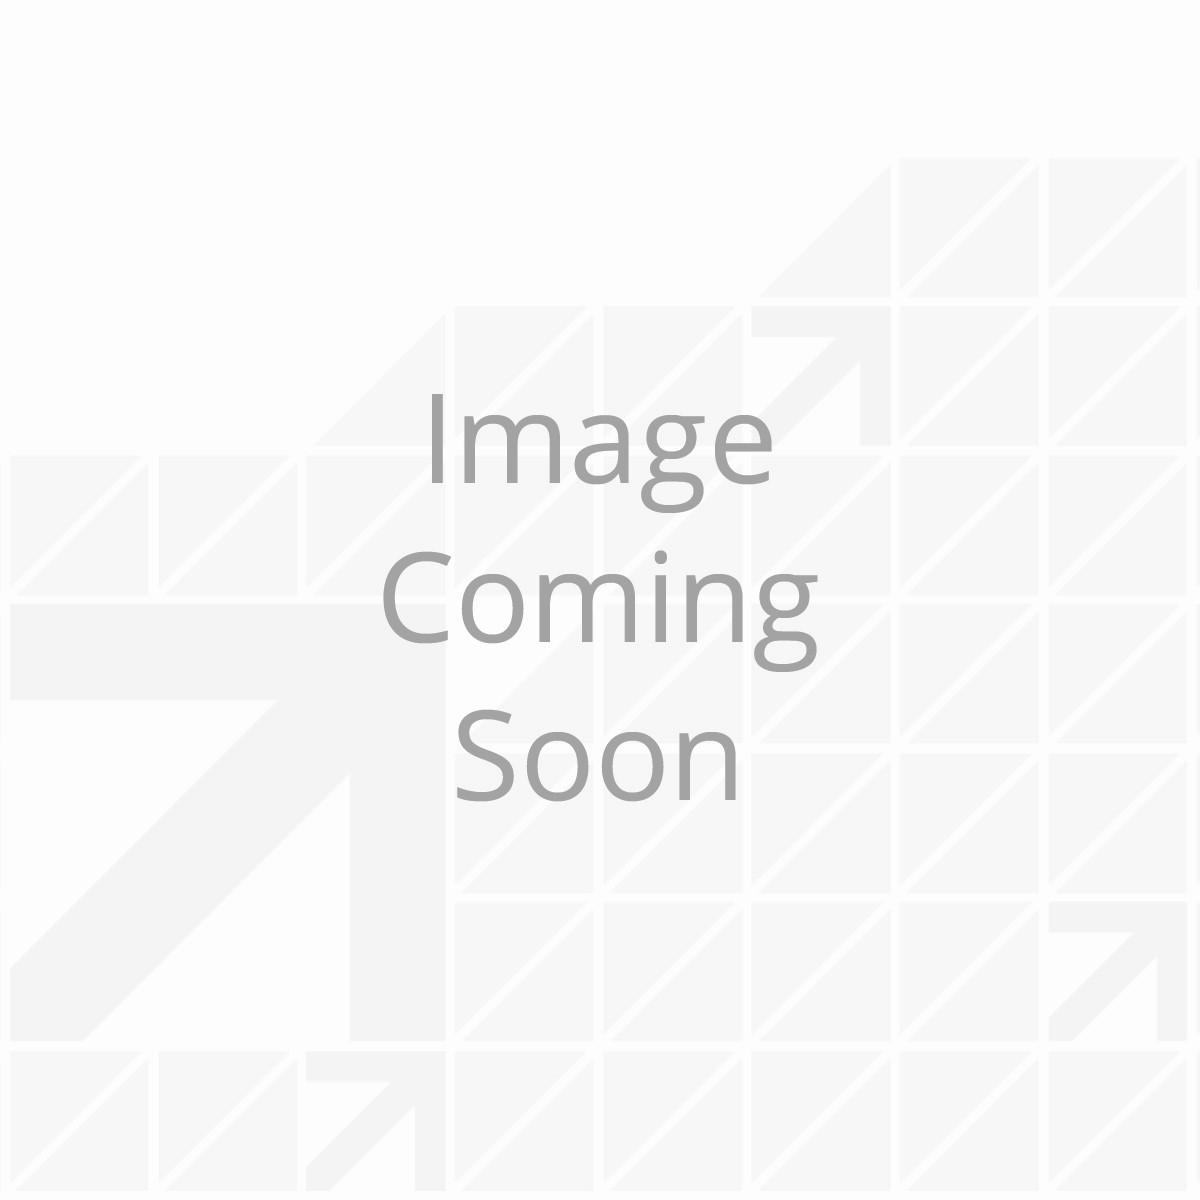 Leveling Hydraulic Hose Kit for Spring Return (1010001273)